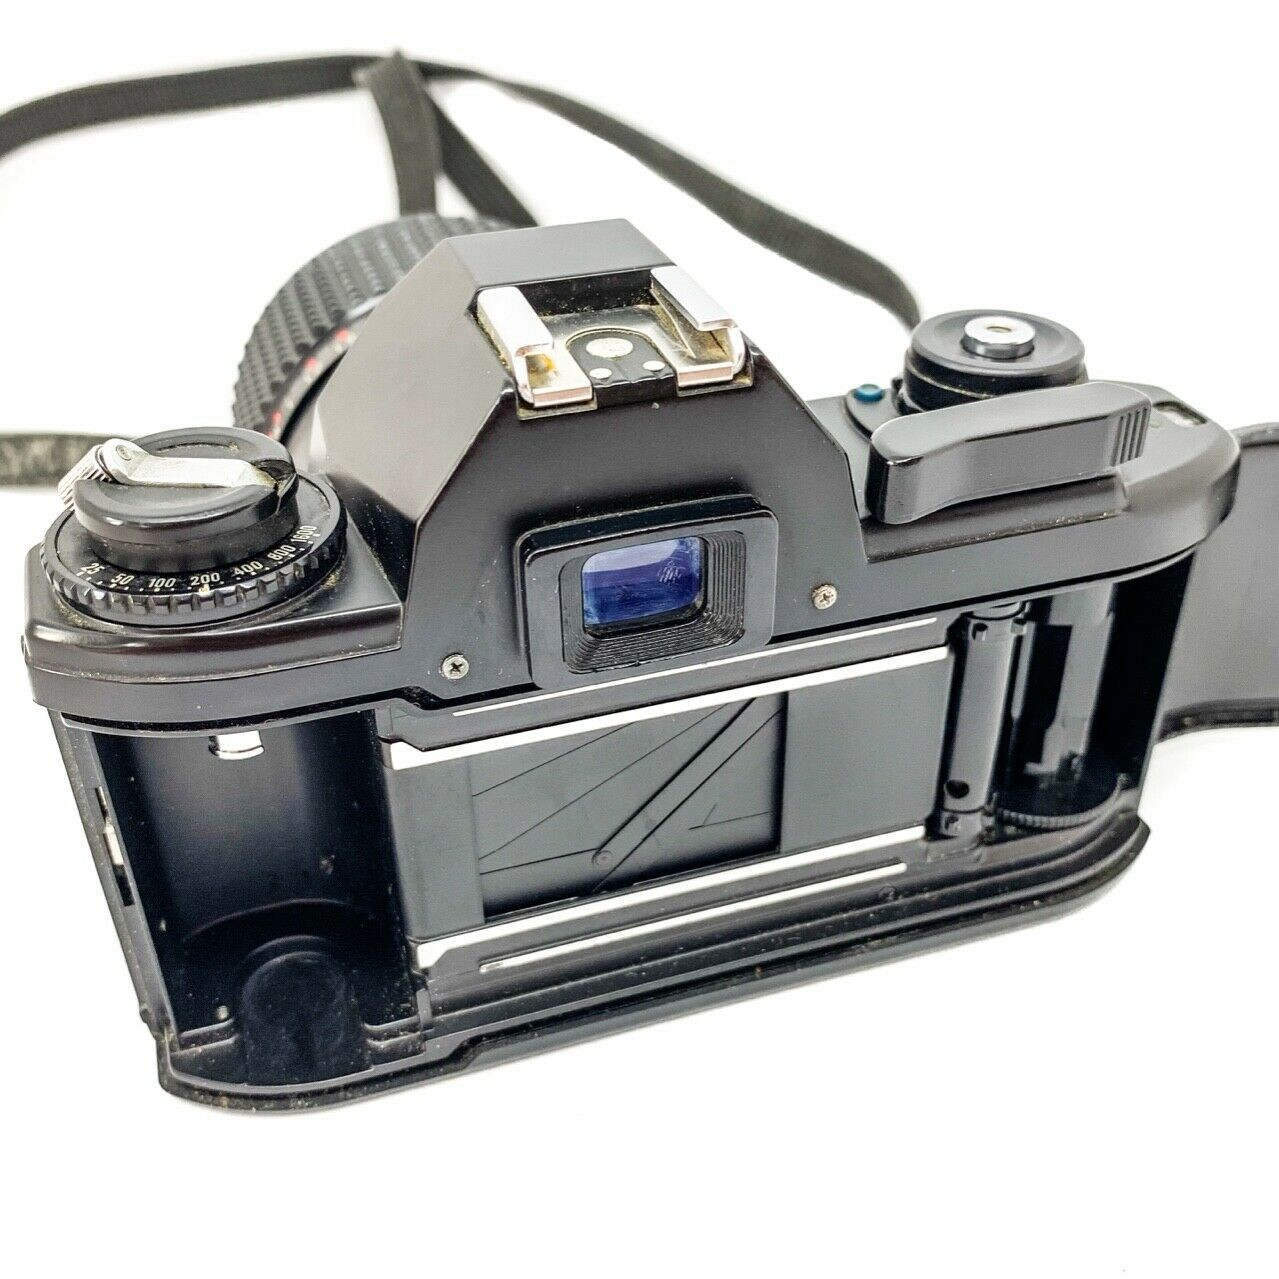 Nikon em 35mm camera on white background